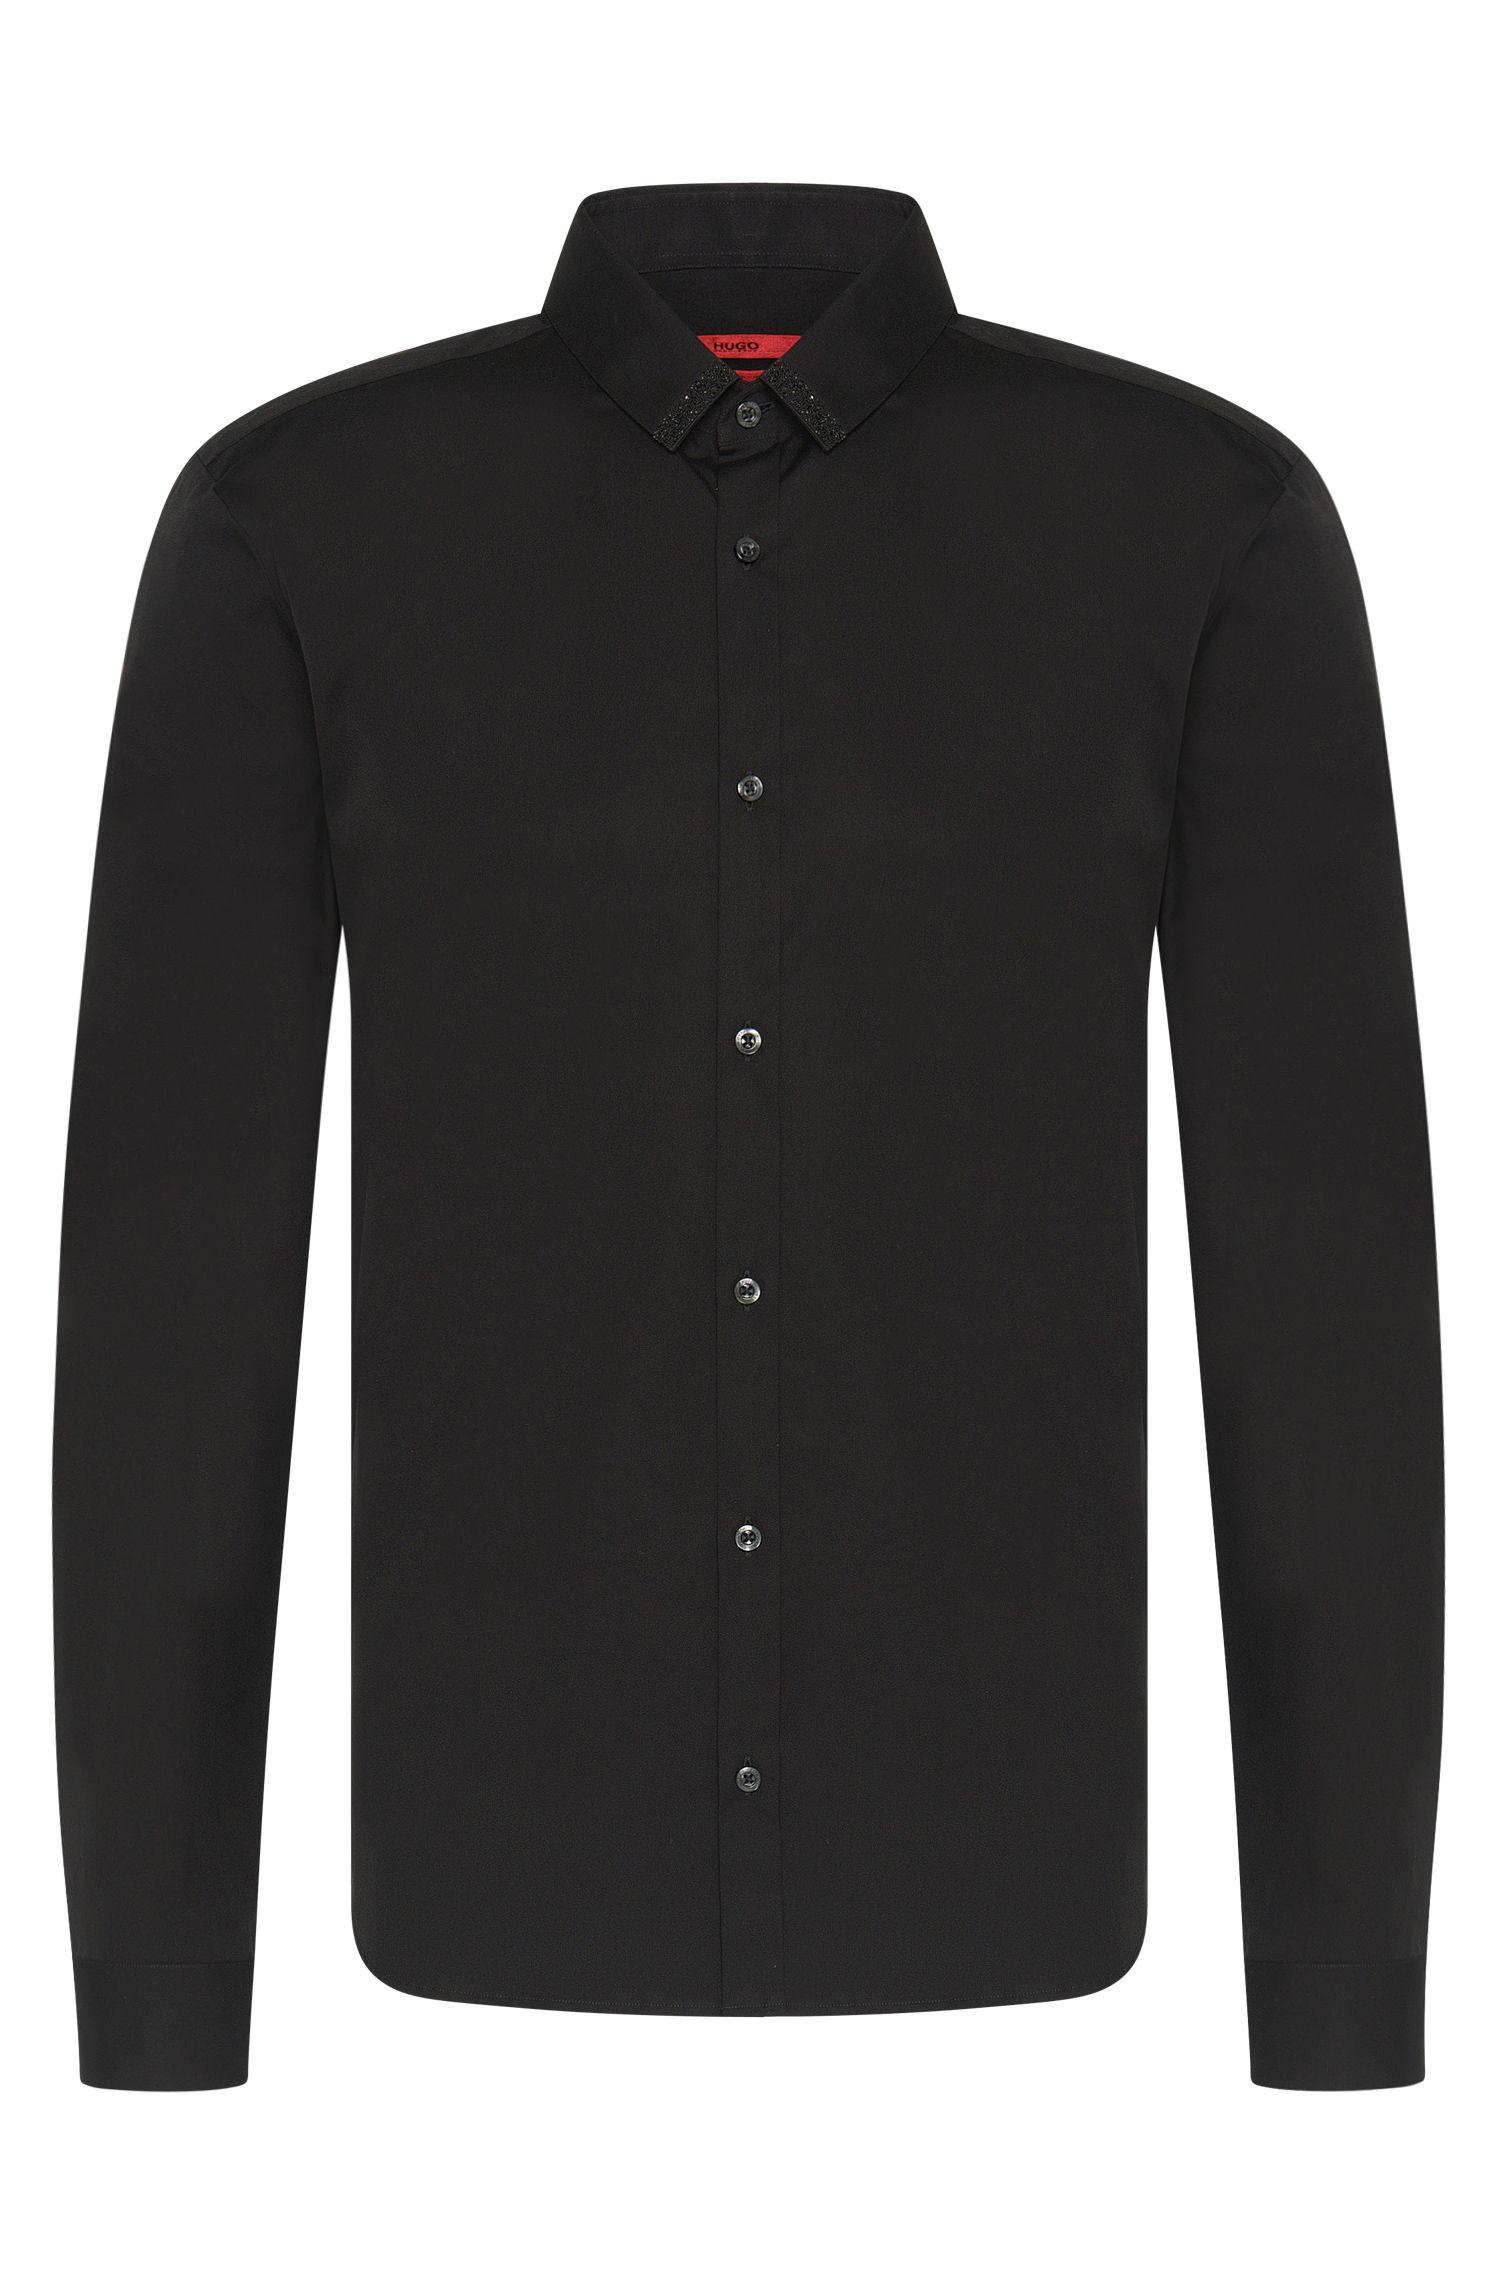 'Ero'   Slim Fit, Stretch Cotton Swarovski Button Down Shirt